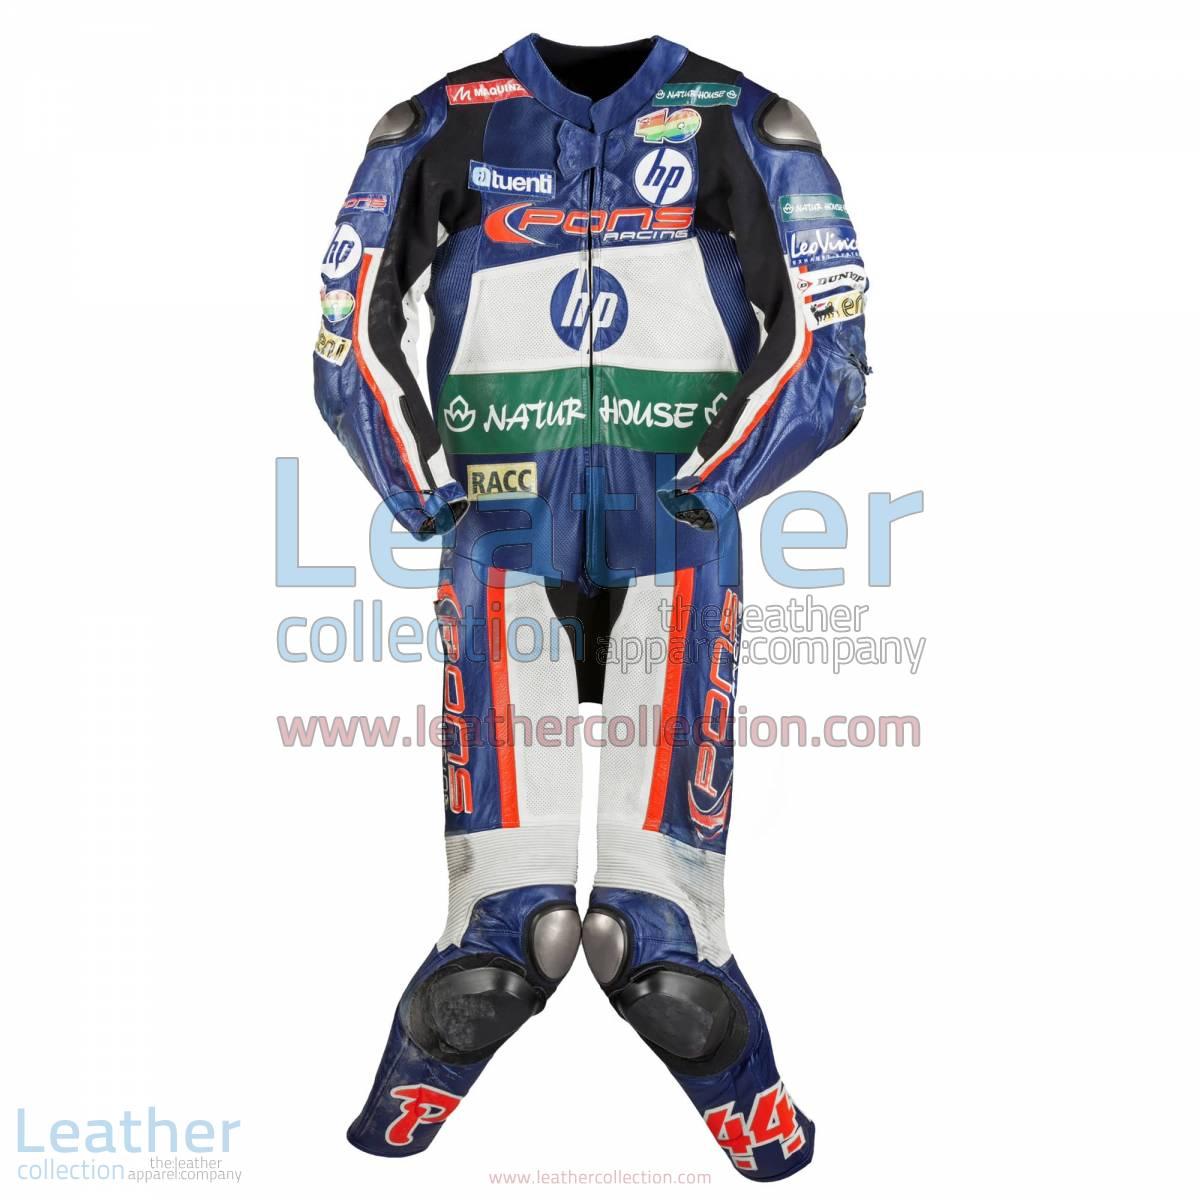 Pol Espargaro Kalex 2012 Motorcycle Racing Suit